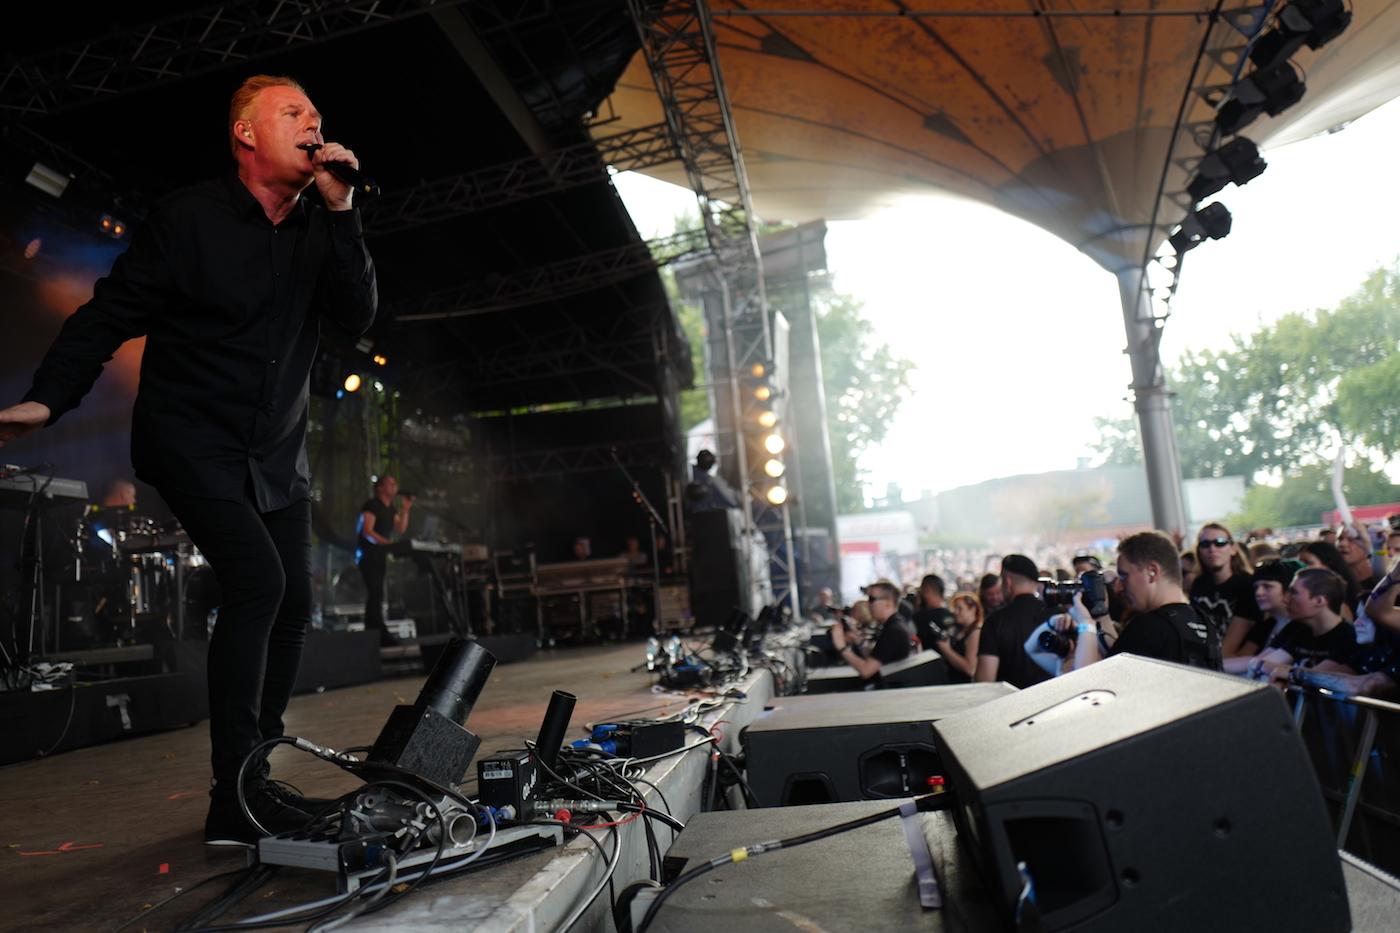 mark_benecke_amphi_festival_koeln_cologne_tanzbrunnen_gothic_OMD_oomph_agonoize_mono_inc_es23_sitd_solar_fake - 74.jpg